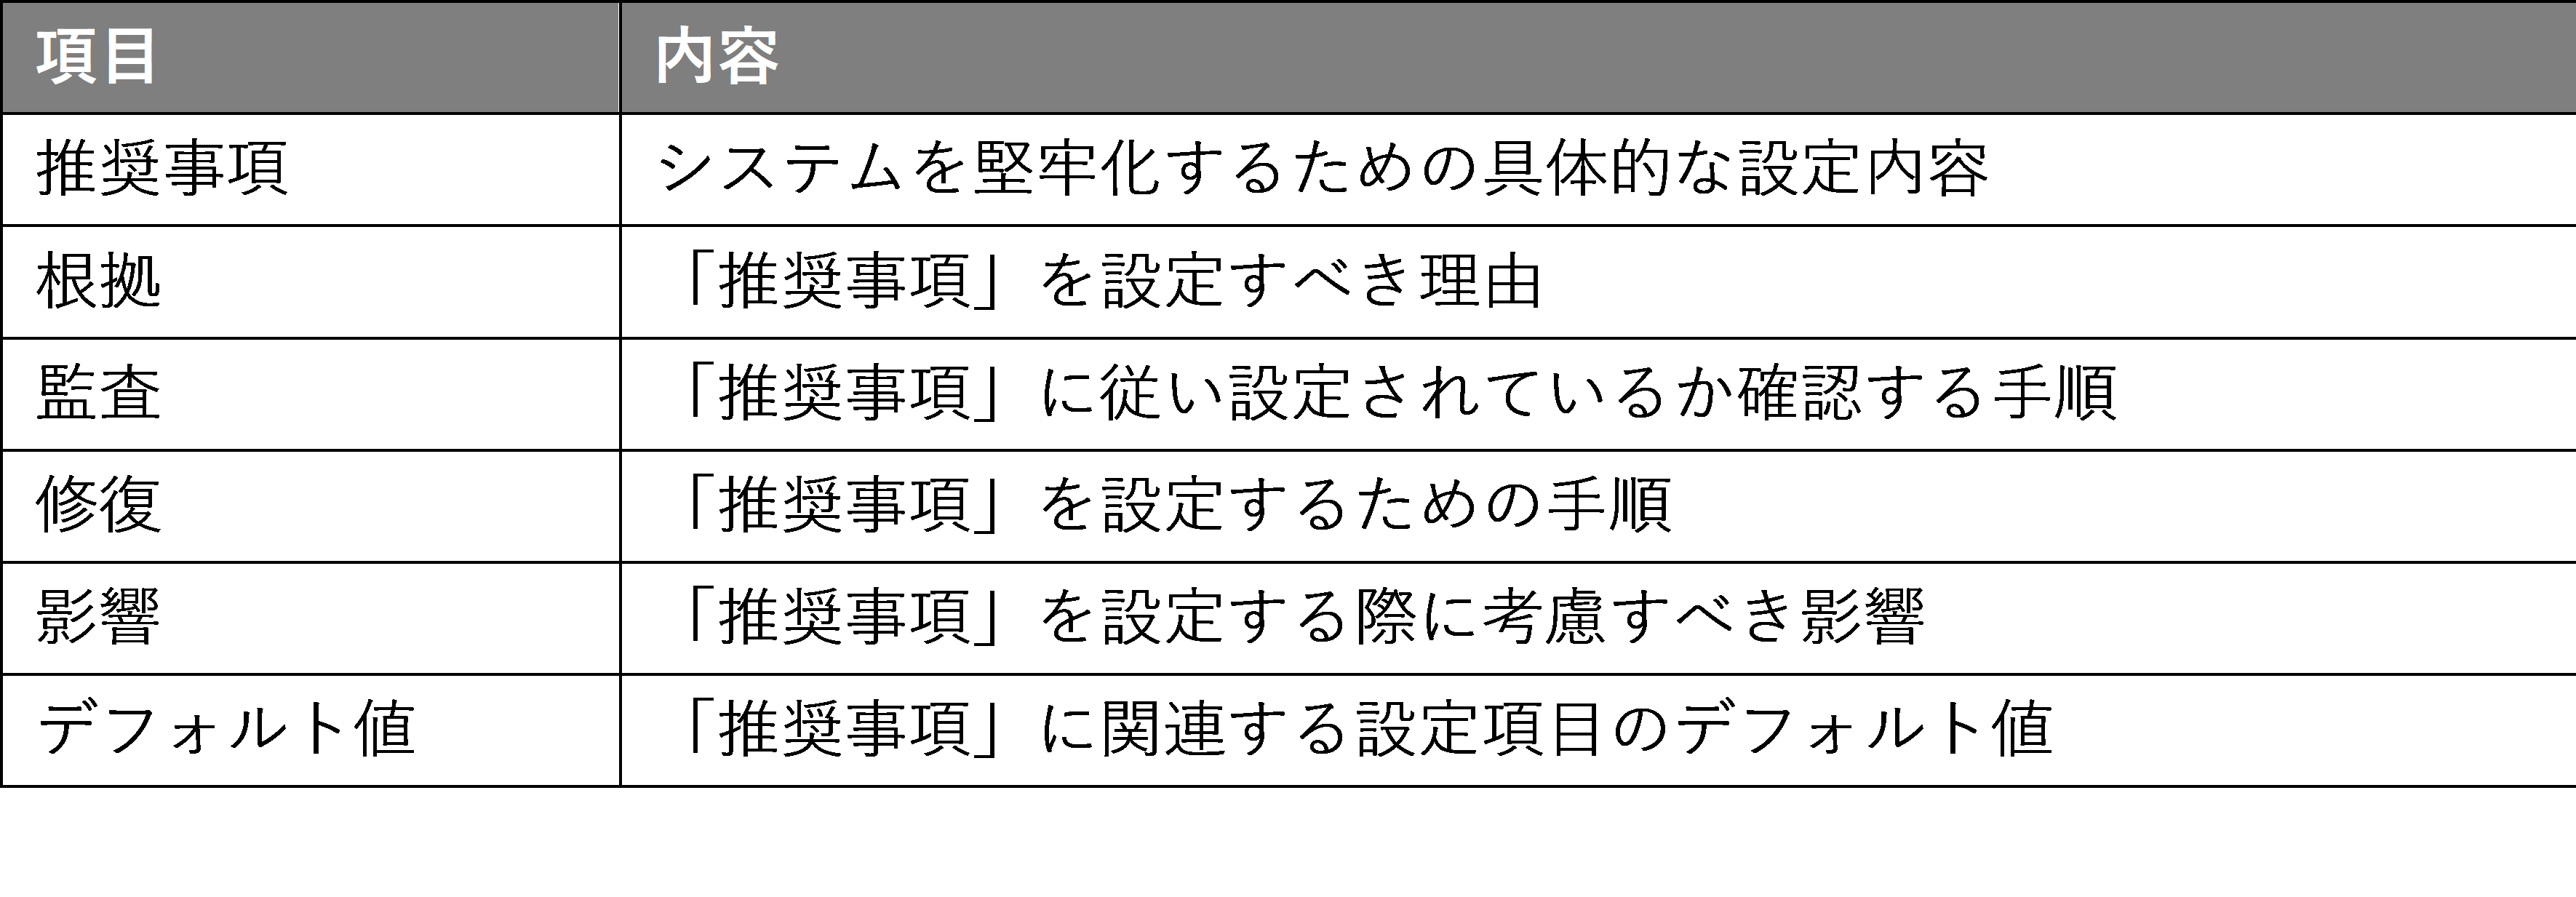 cis-benchmarks_2